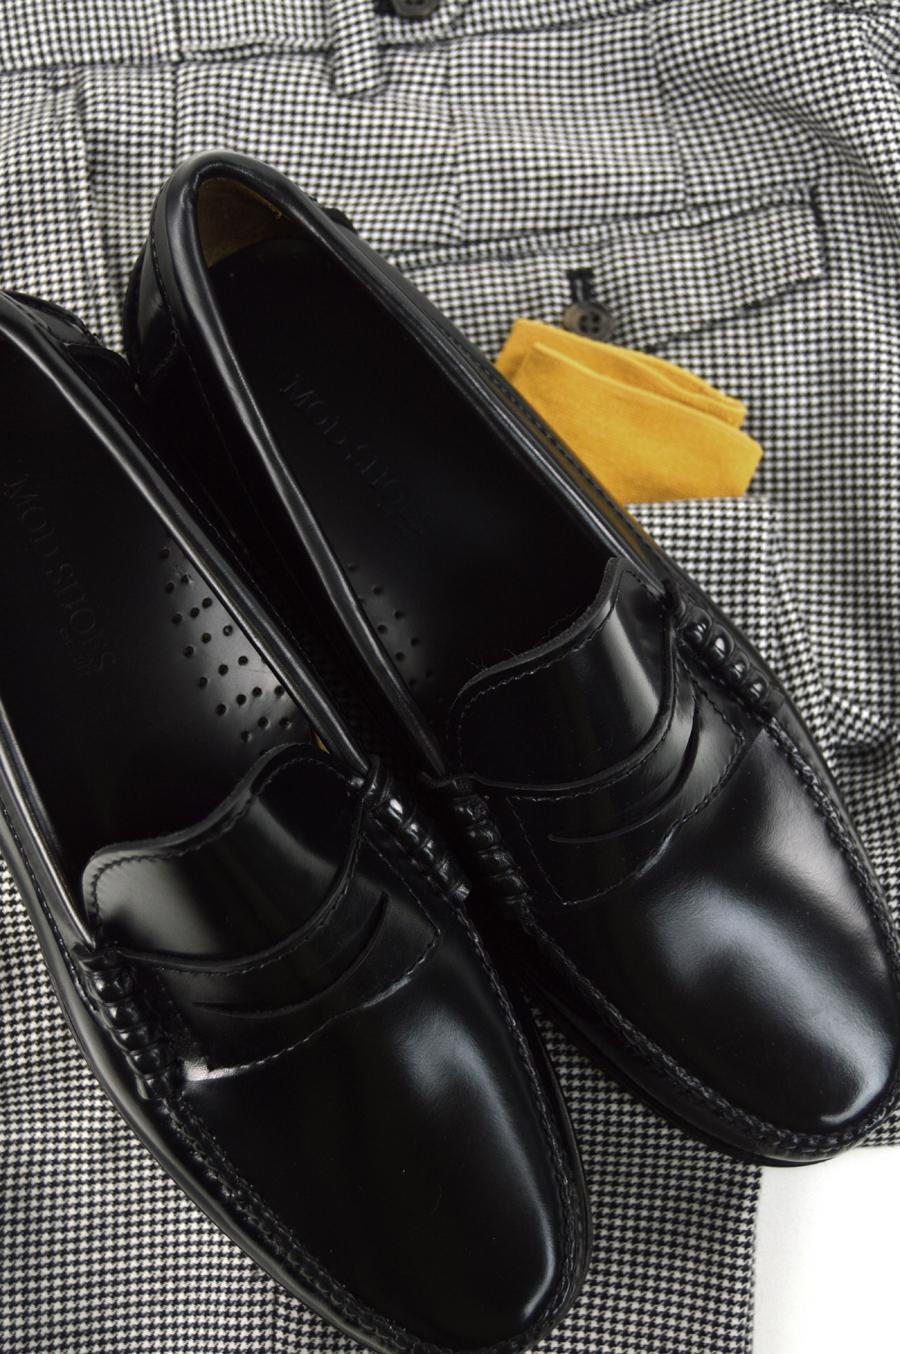 modshoes-black-loafers-buckle-tassel-jan-2017-18